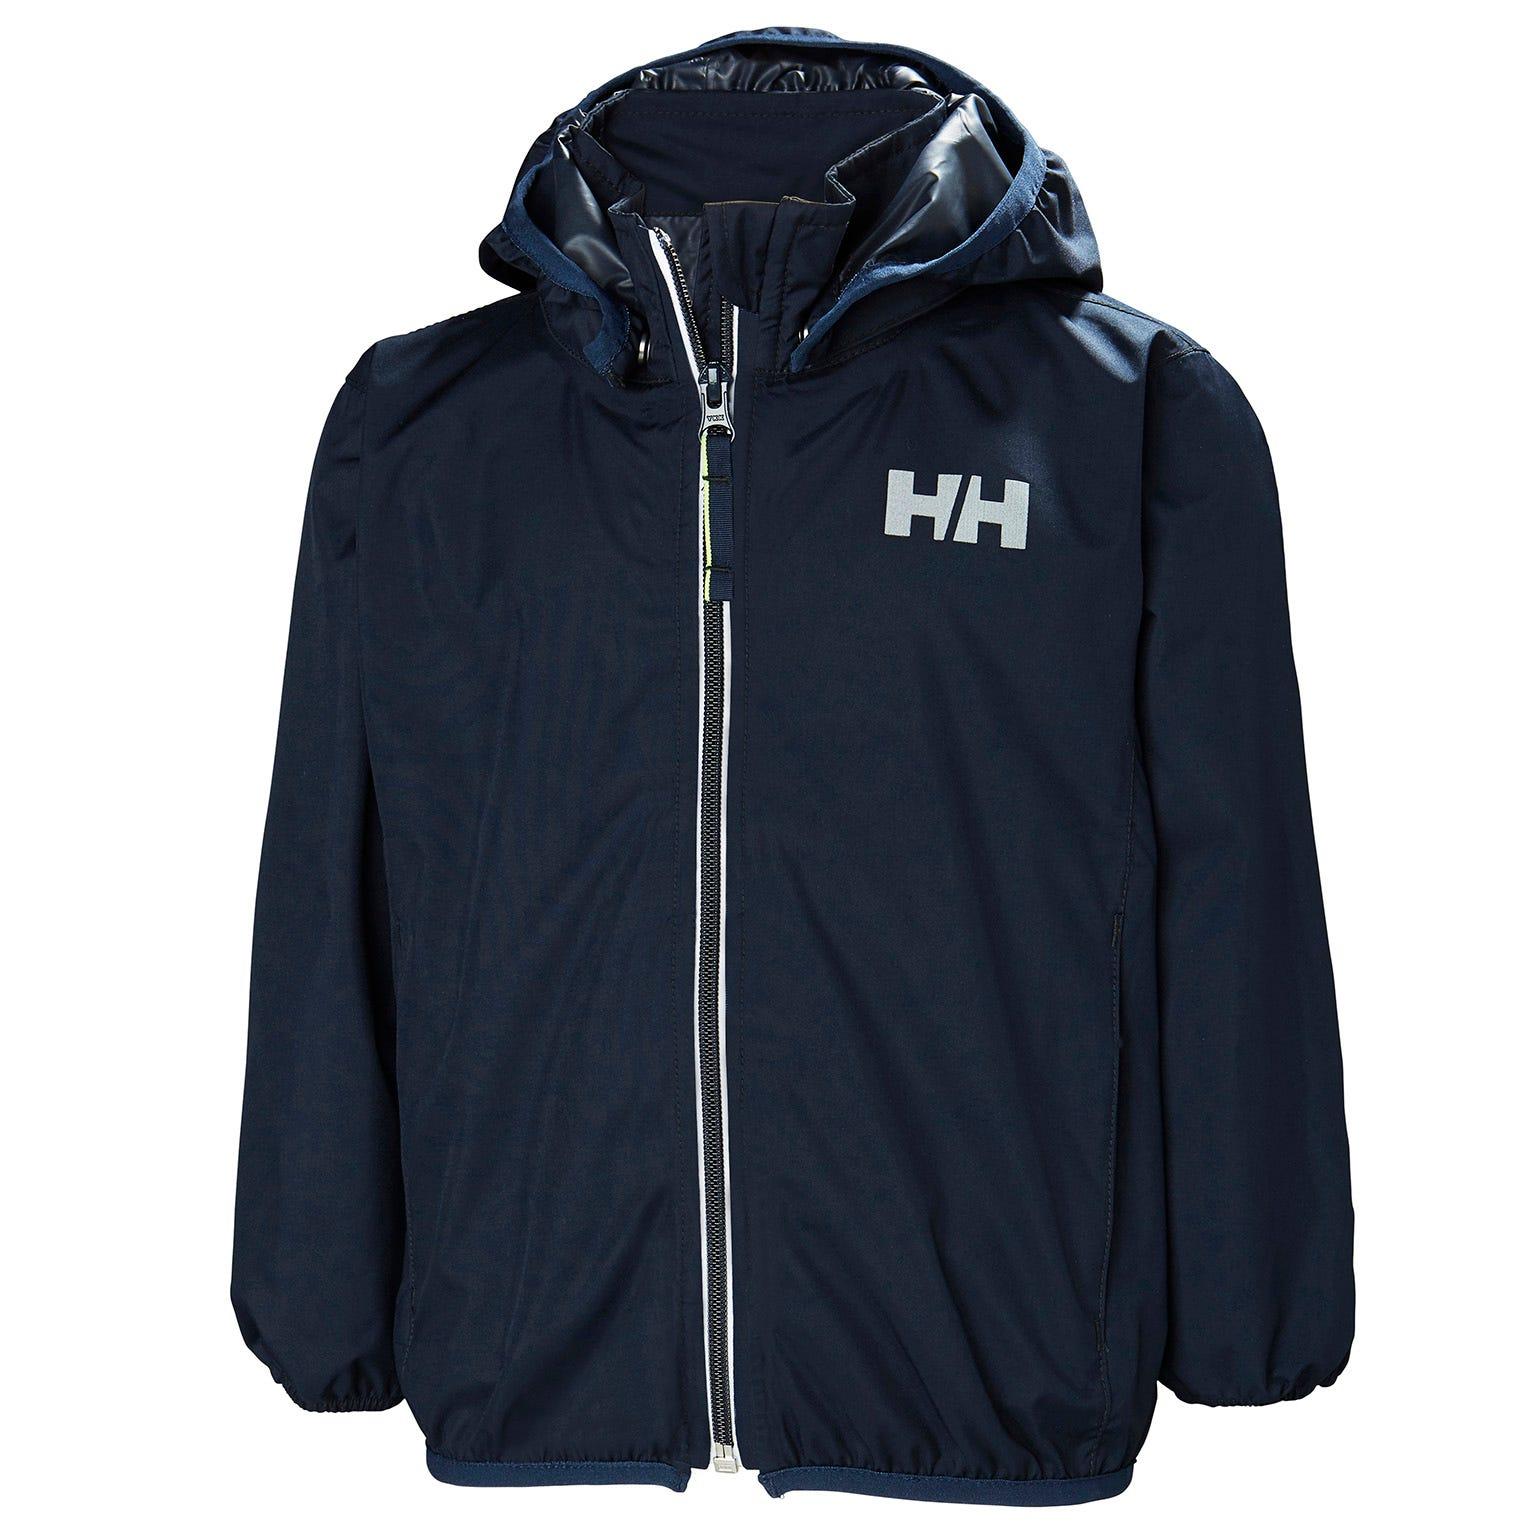 Helly Hansen Kids Helium Packable Jacket Parka Navy 134/9